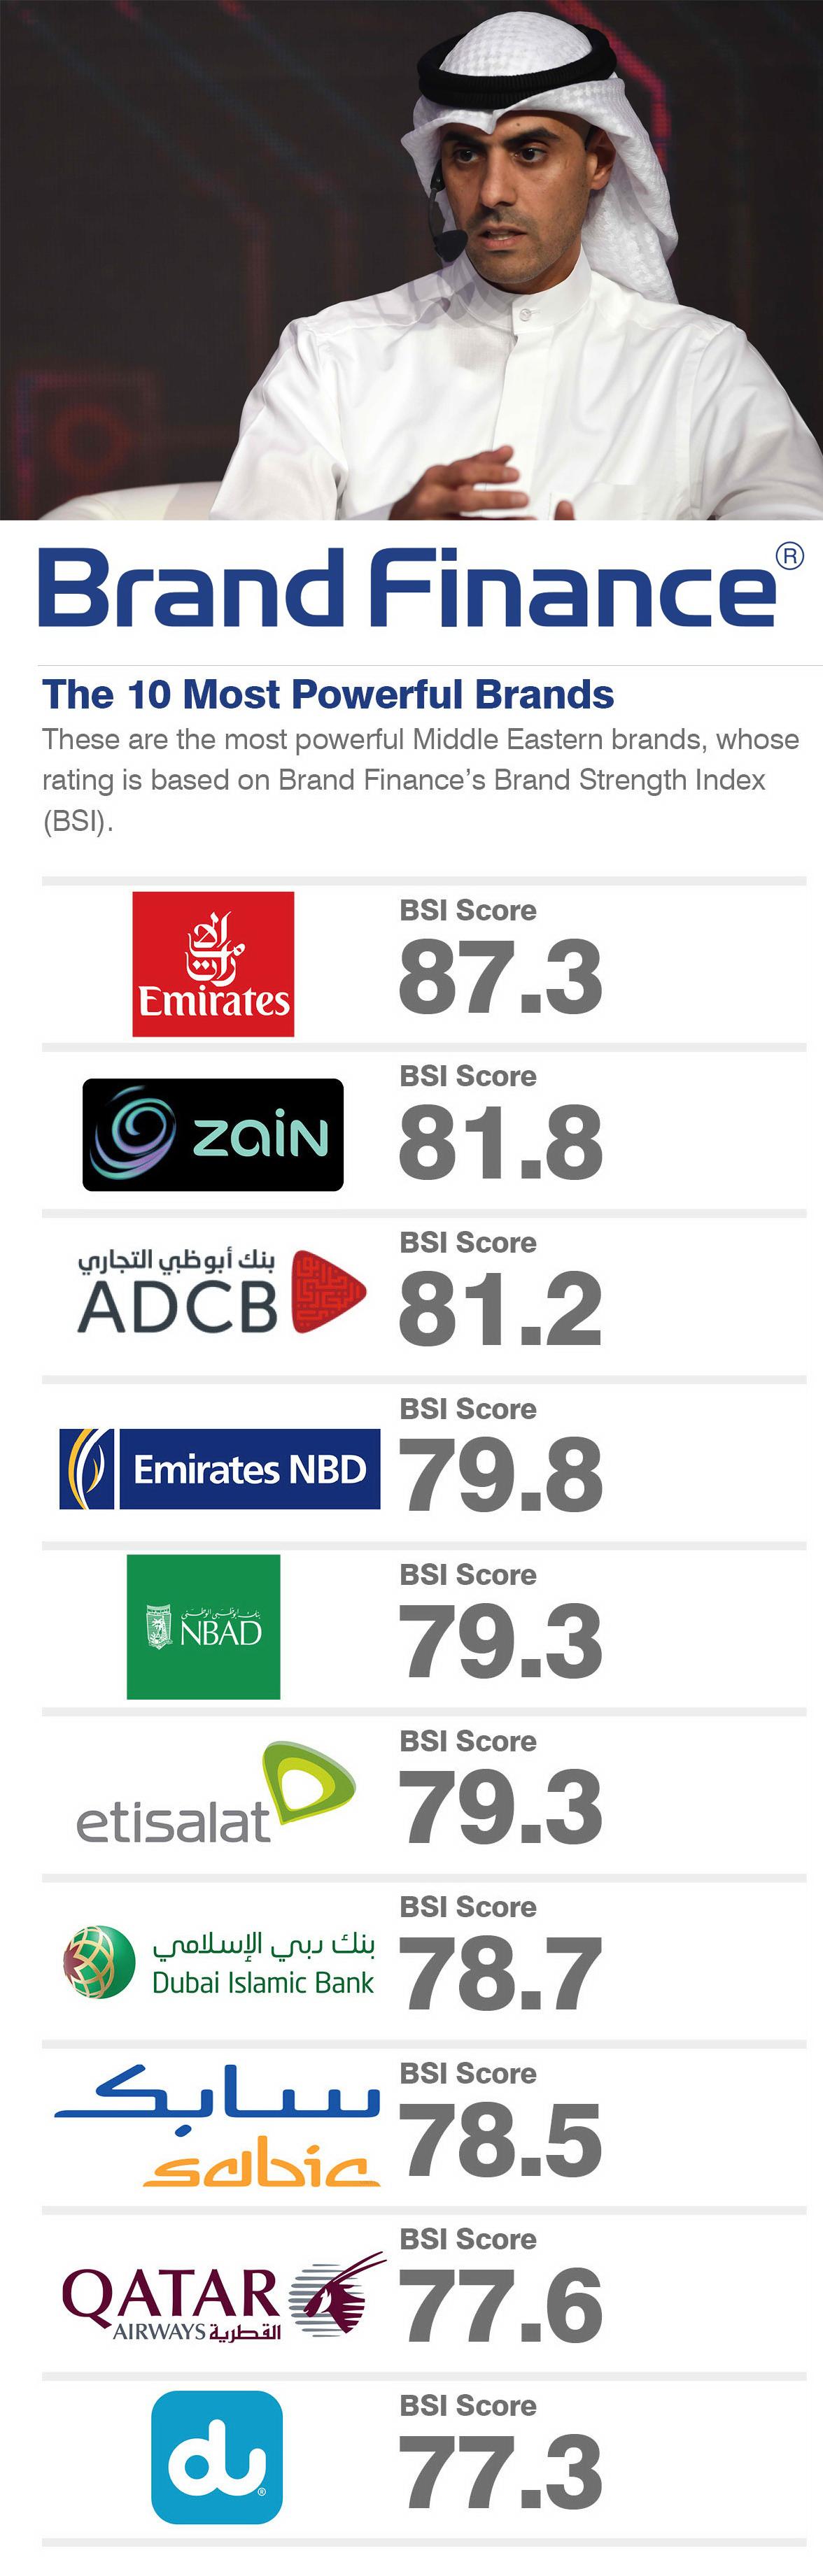 Brand Finance ranks Zain as 2nd most powerful brand in-region